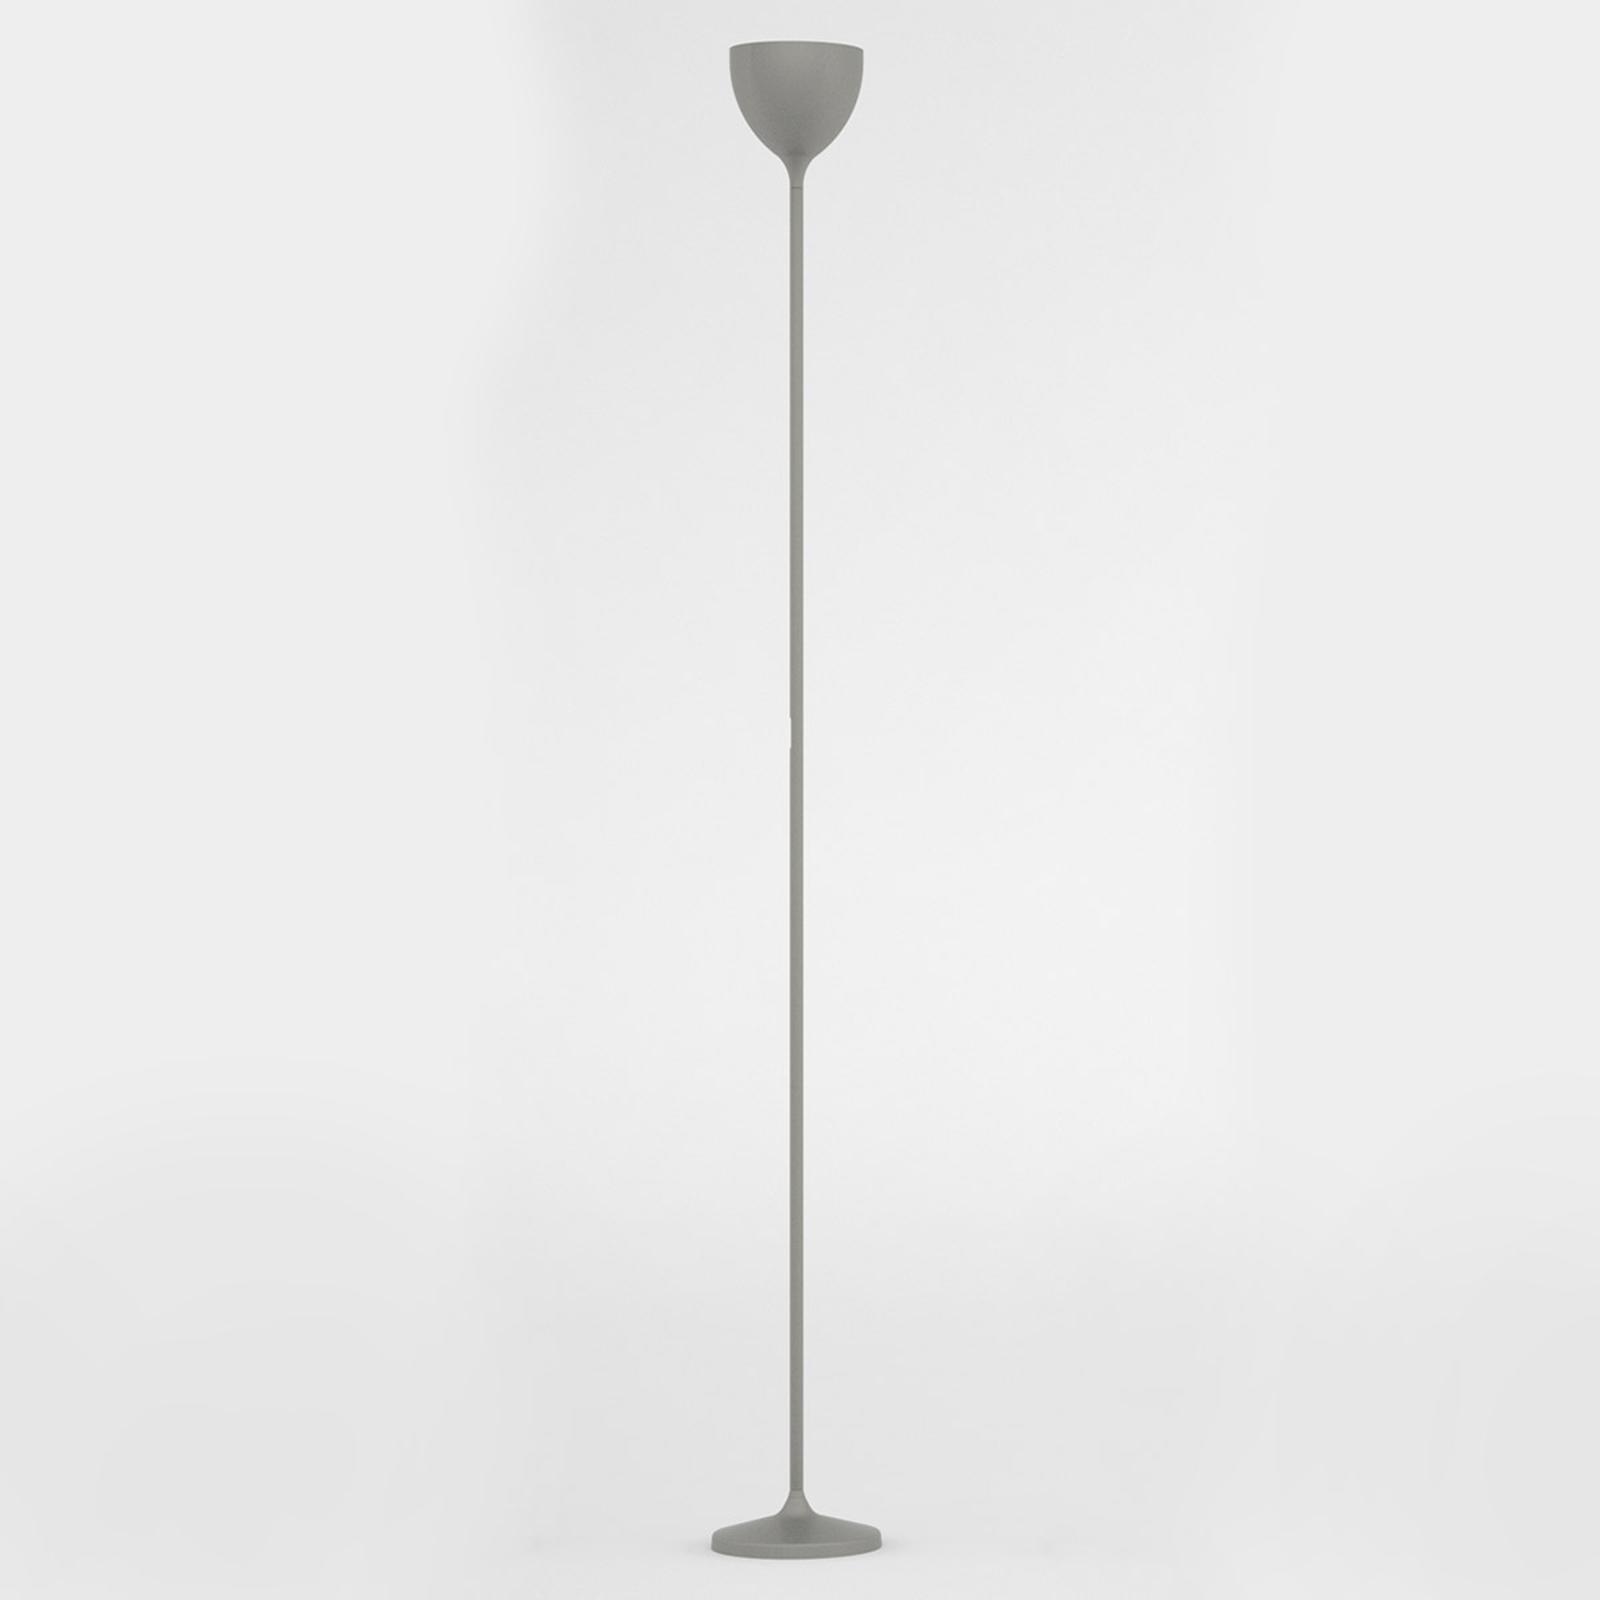 Rotaliana Drink LED-golvlampa, grafit